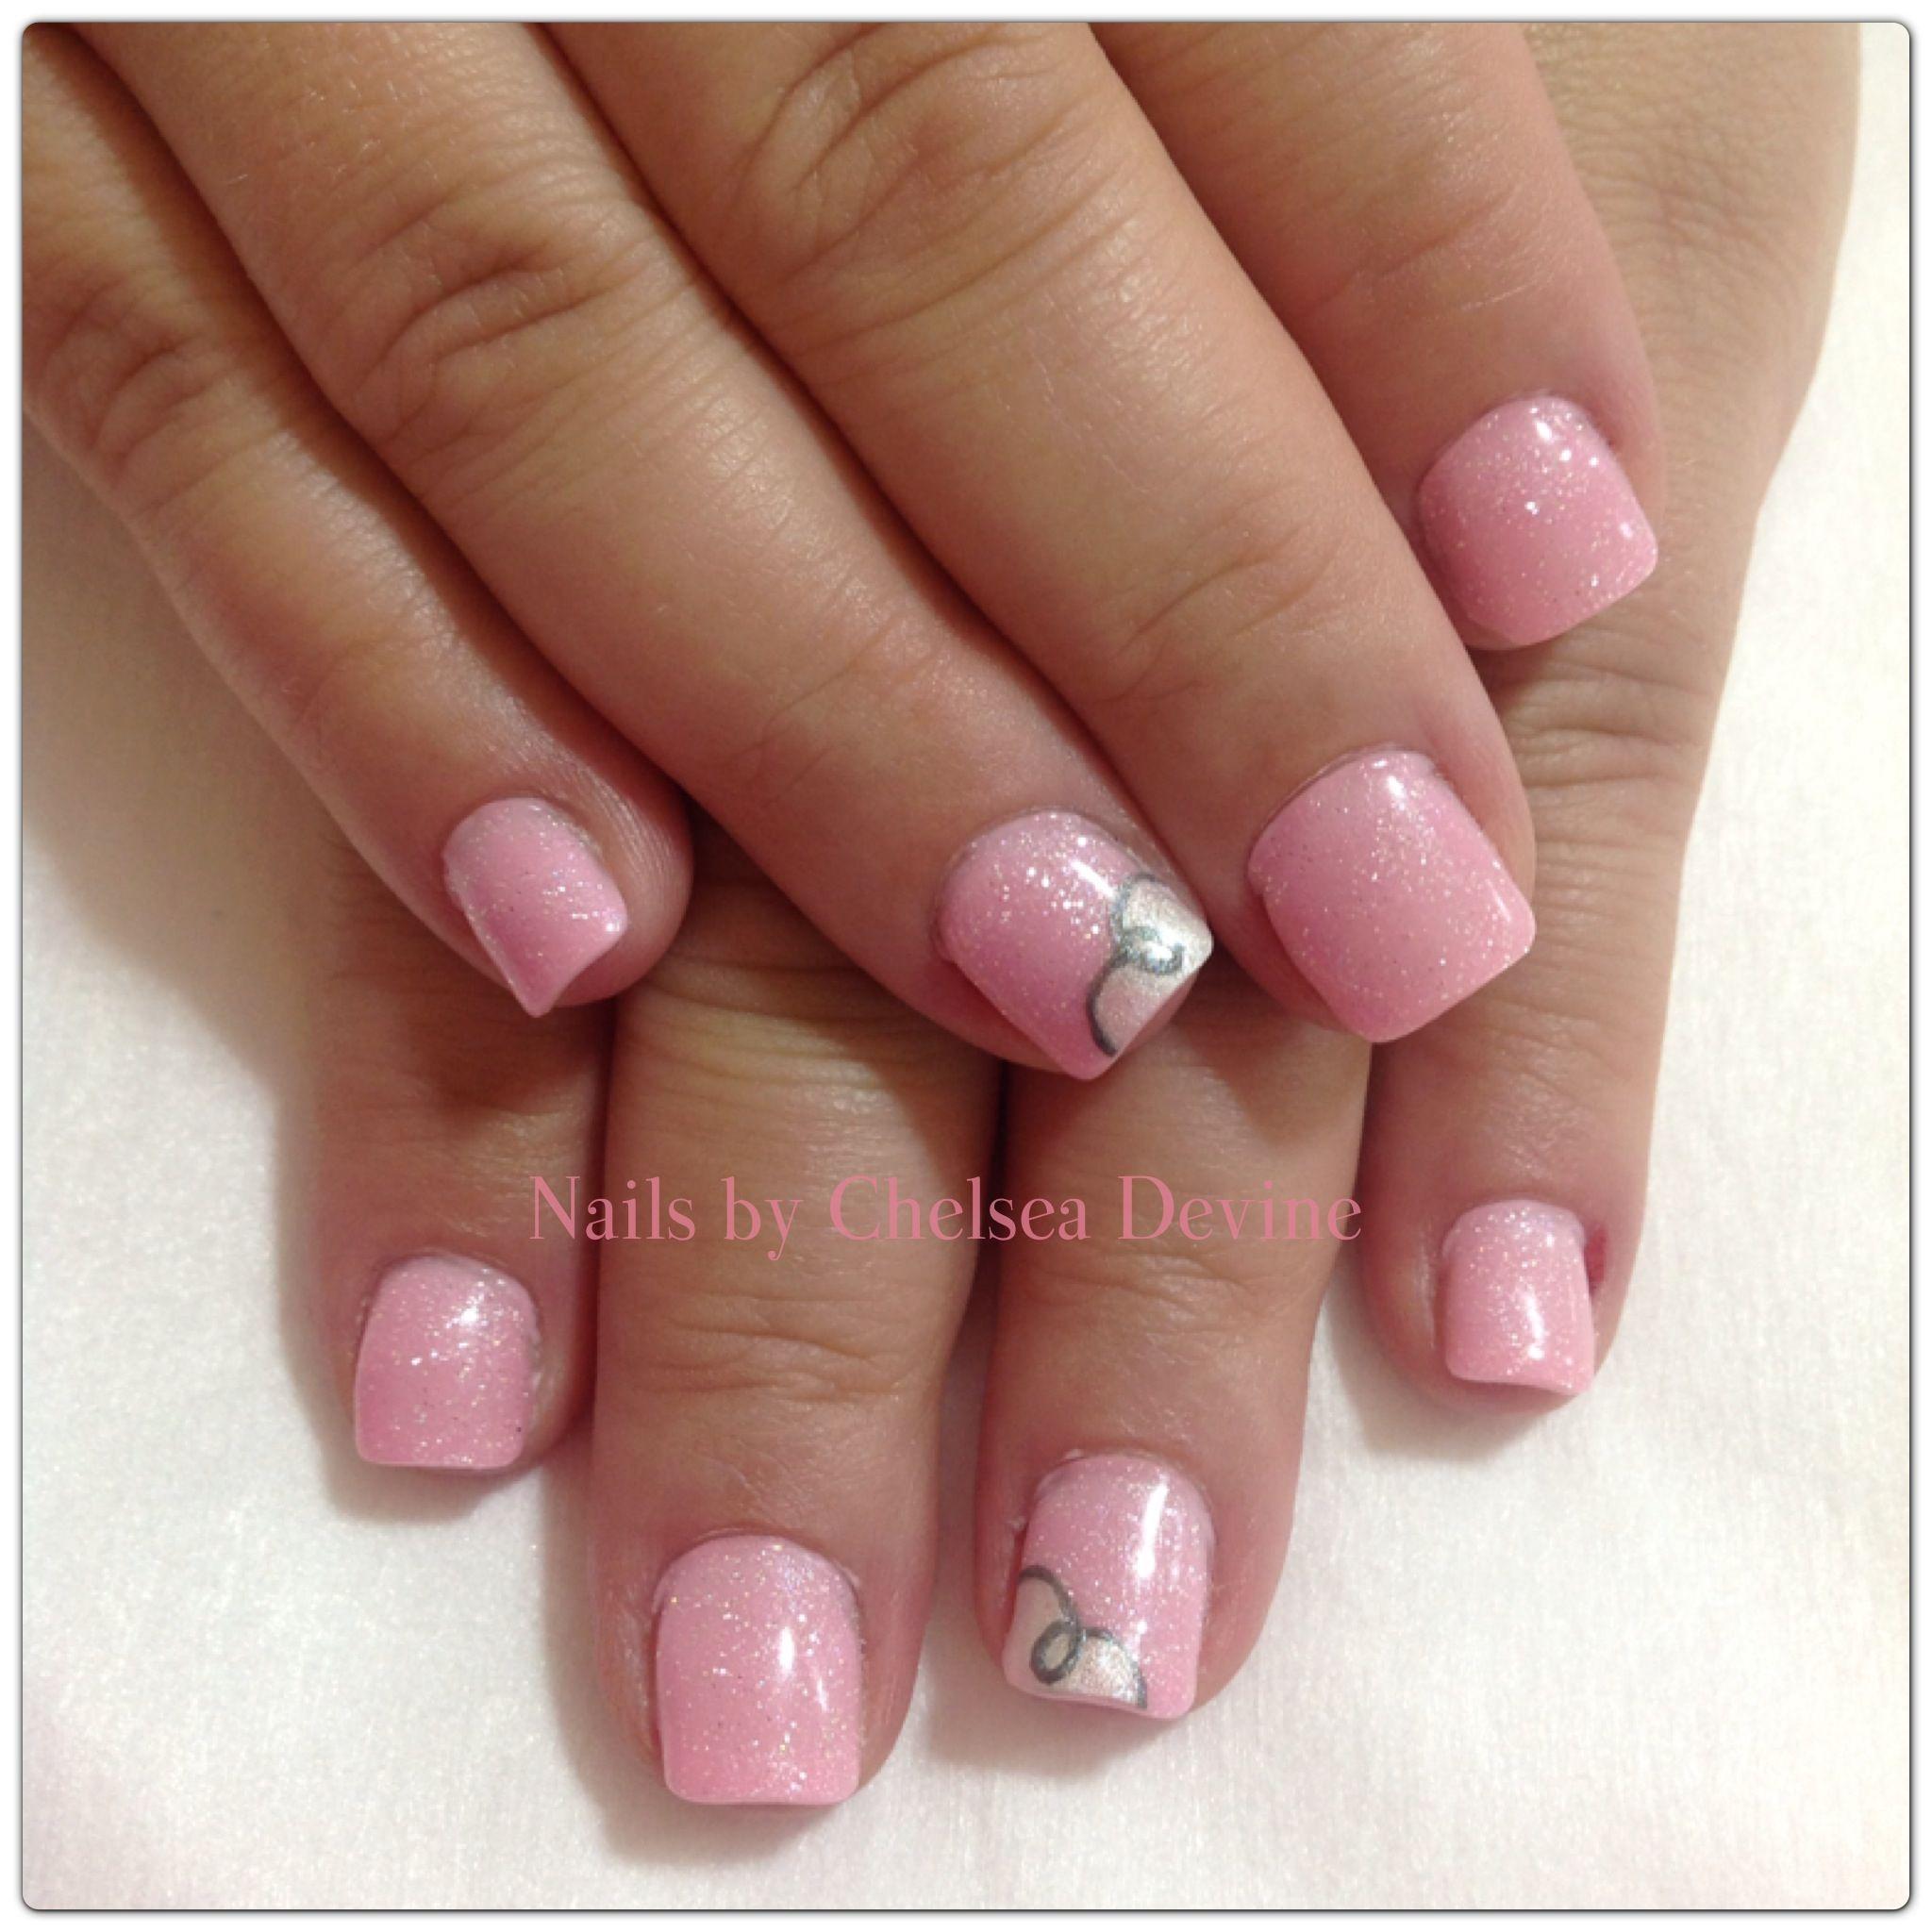 Gel Pink Sparkles summer nails 2013 @Chelsea Devine | Nails by ...